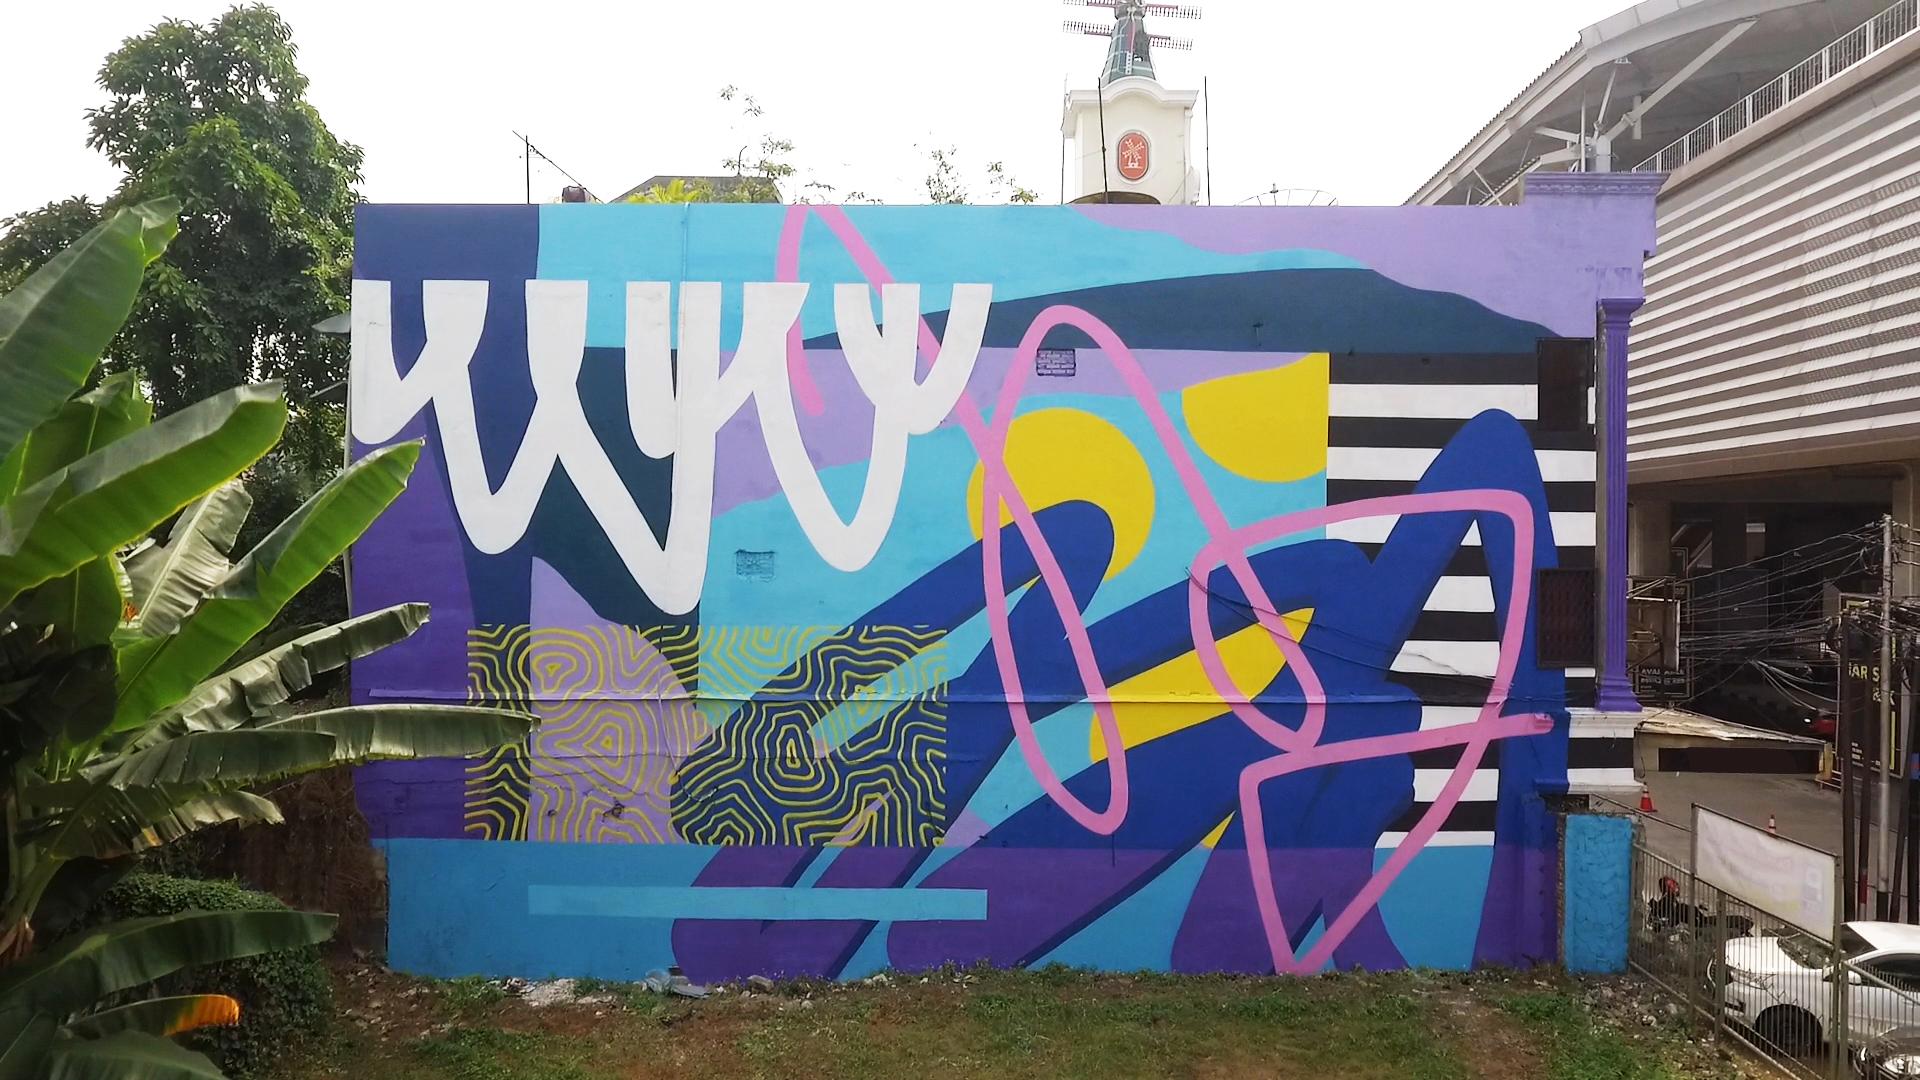 Stereoflow dan Mahavisual Persembahkan Mural untuk Jakarta, Hadirkan Semangat Kebebasan